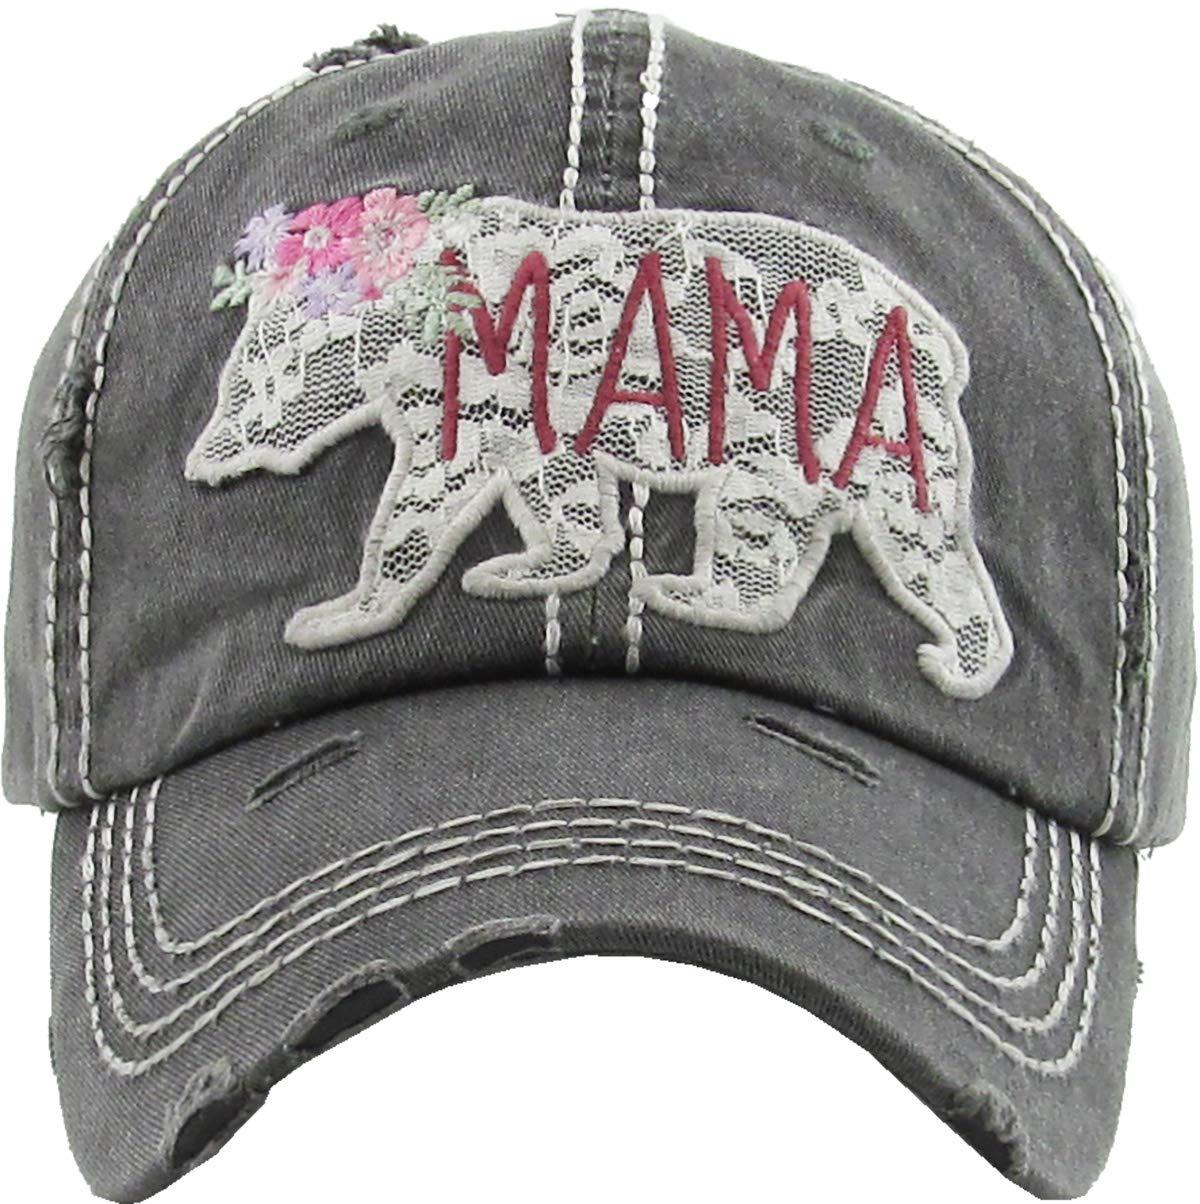 H-212-MBL06 Distressed Baseball Cap Vintage Dad Hat - Mama Bear Lace (Black)